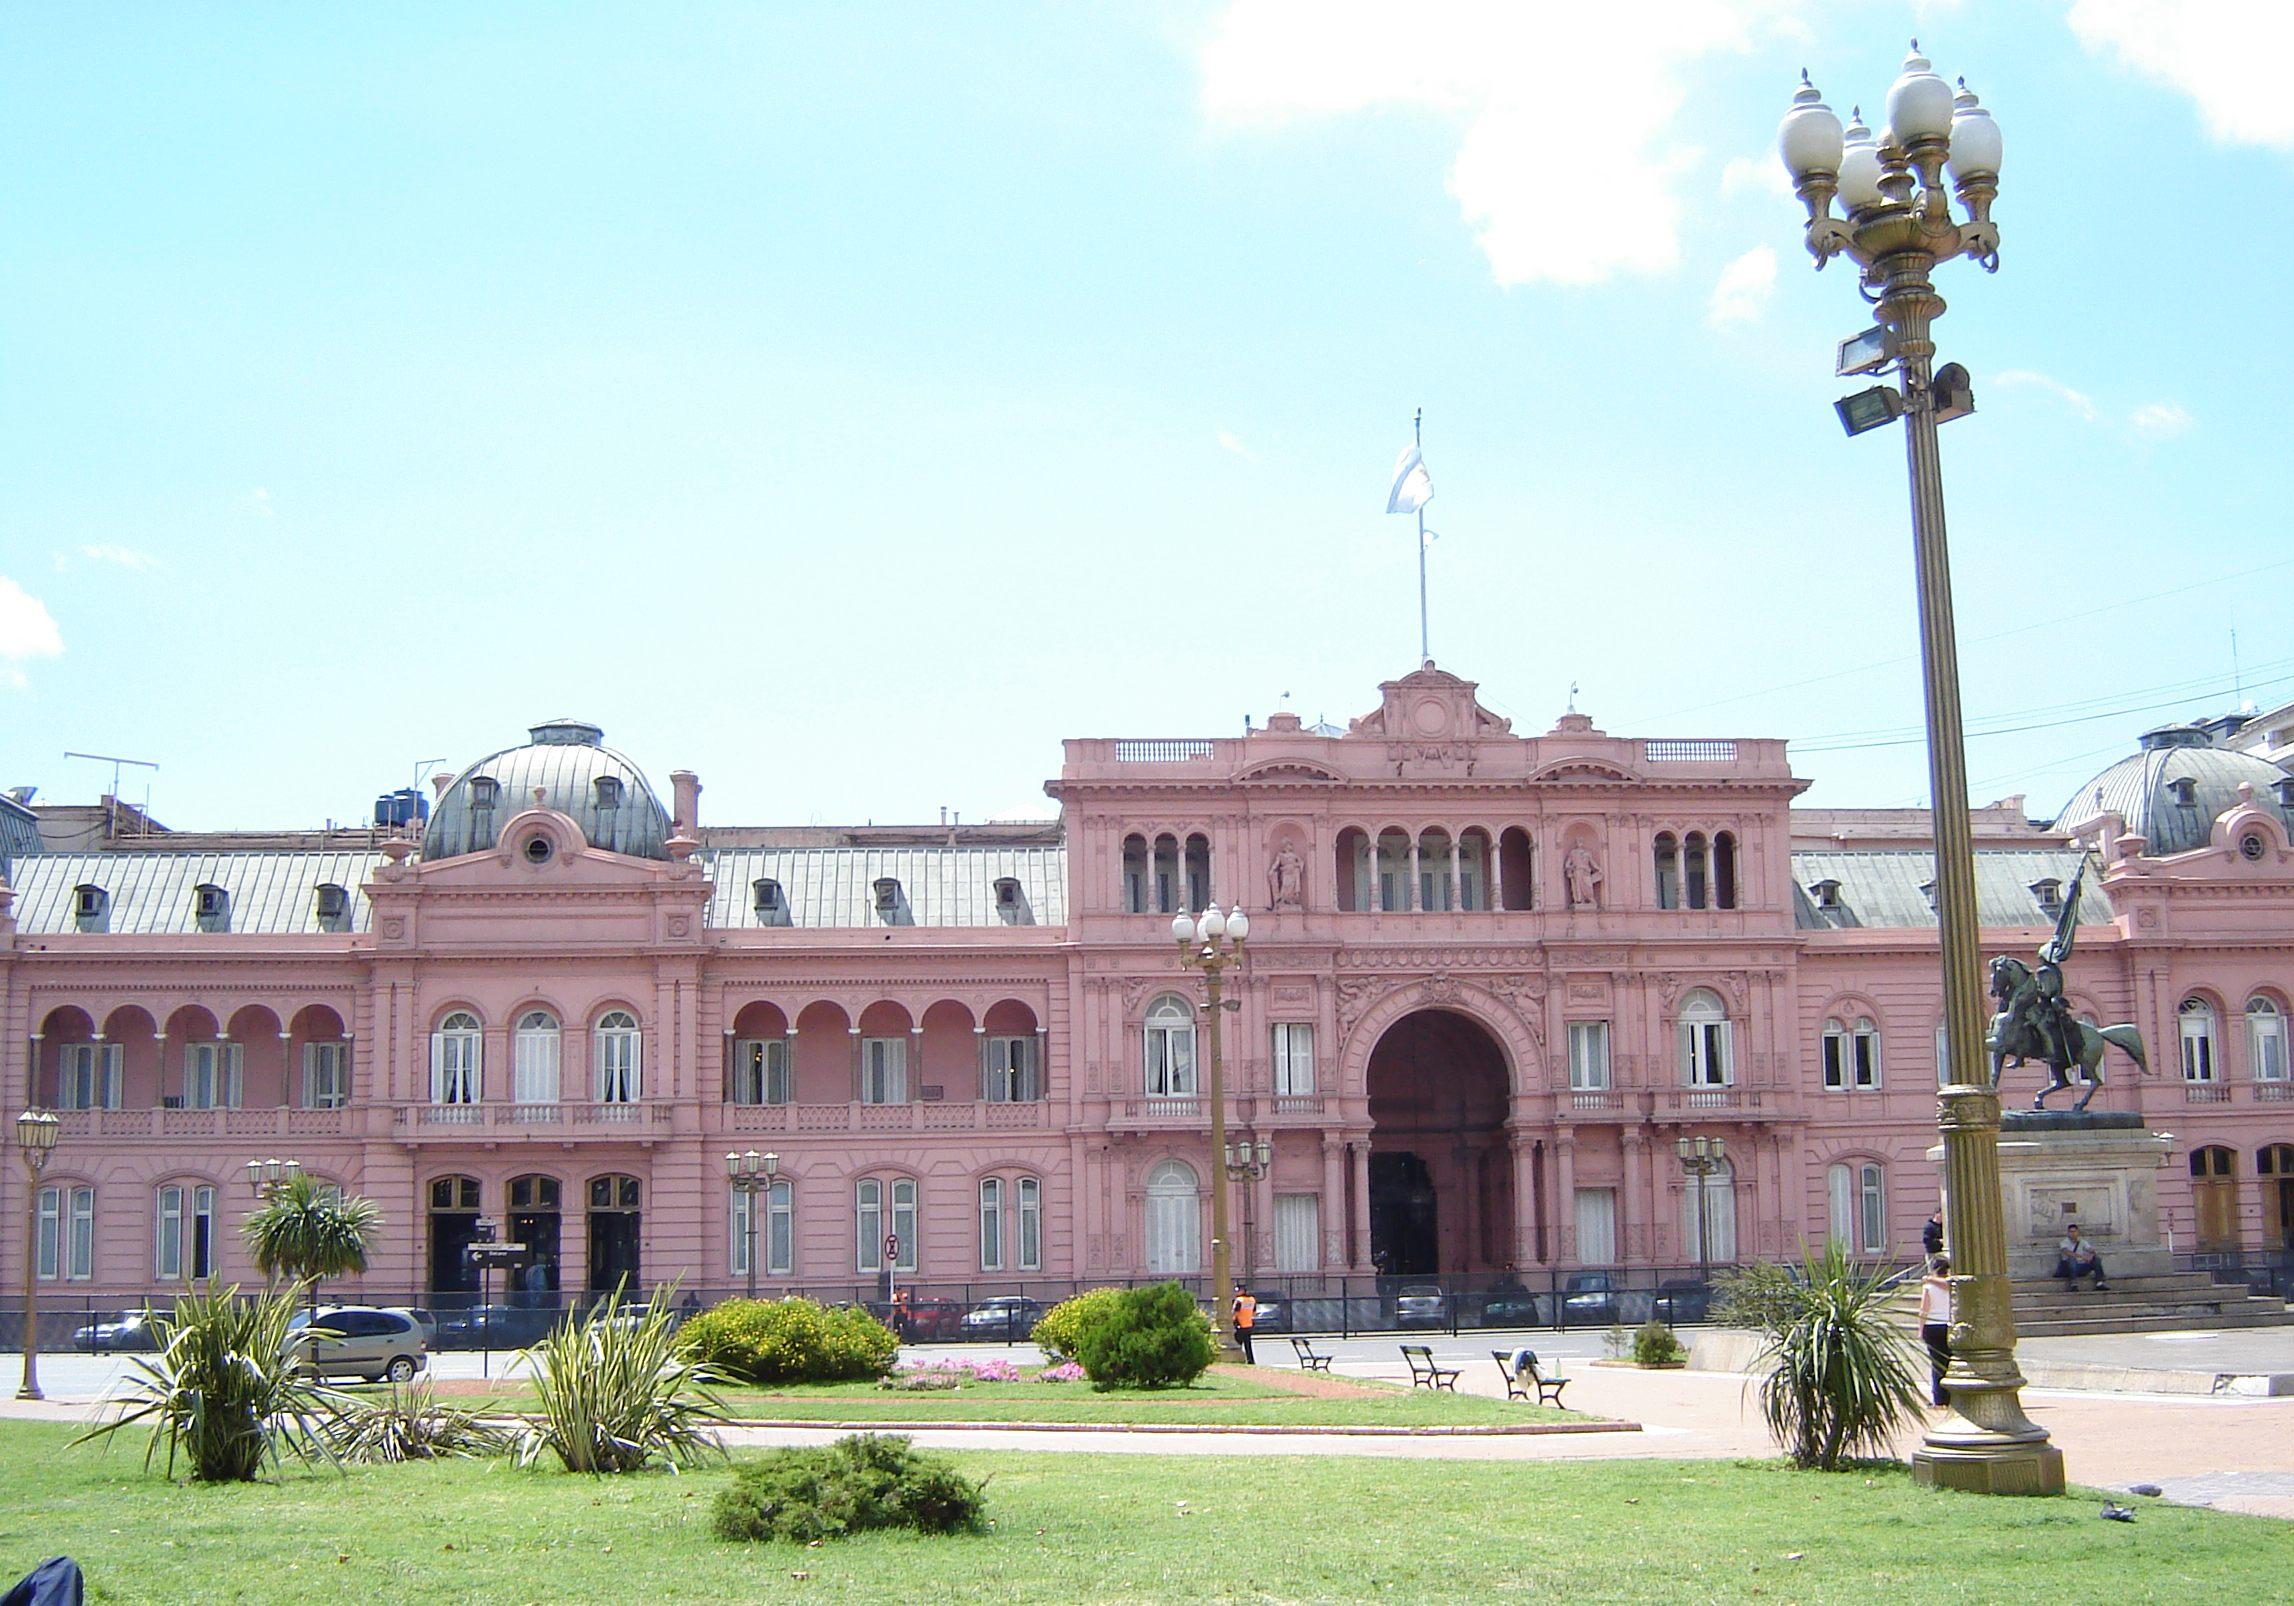 Casa Rosada Executive Mansion in Buenos Aires, Argentina